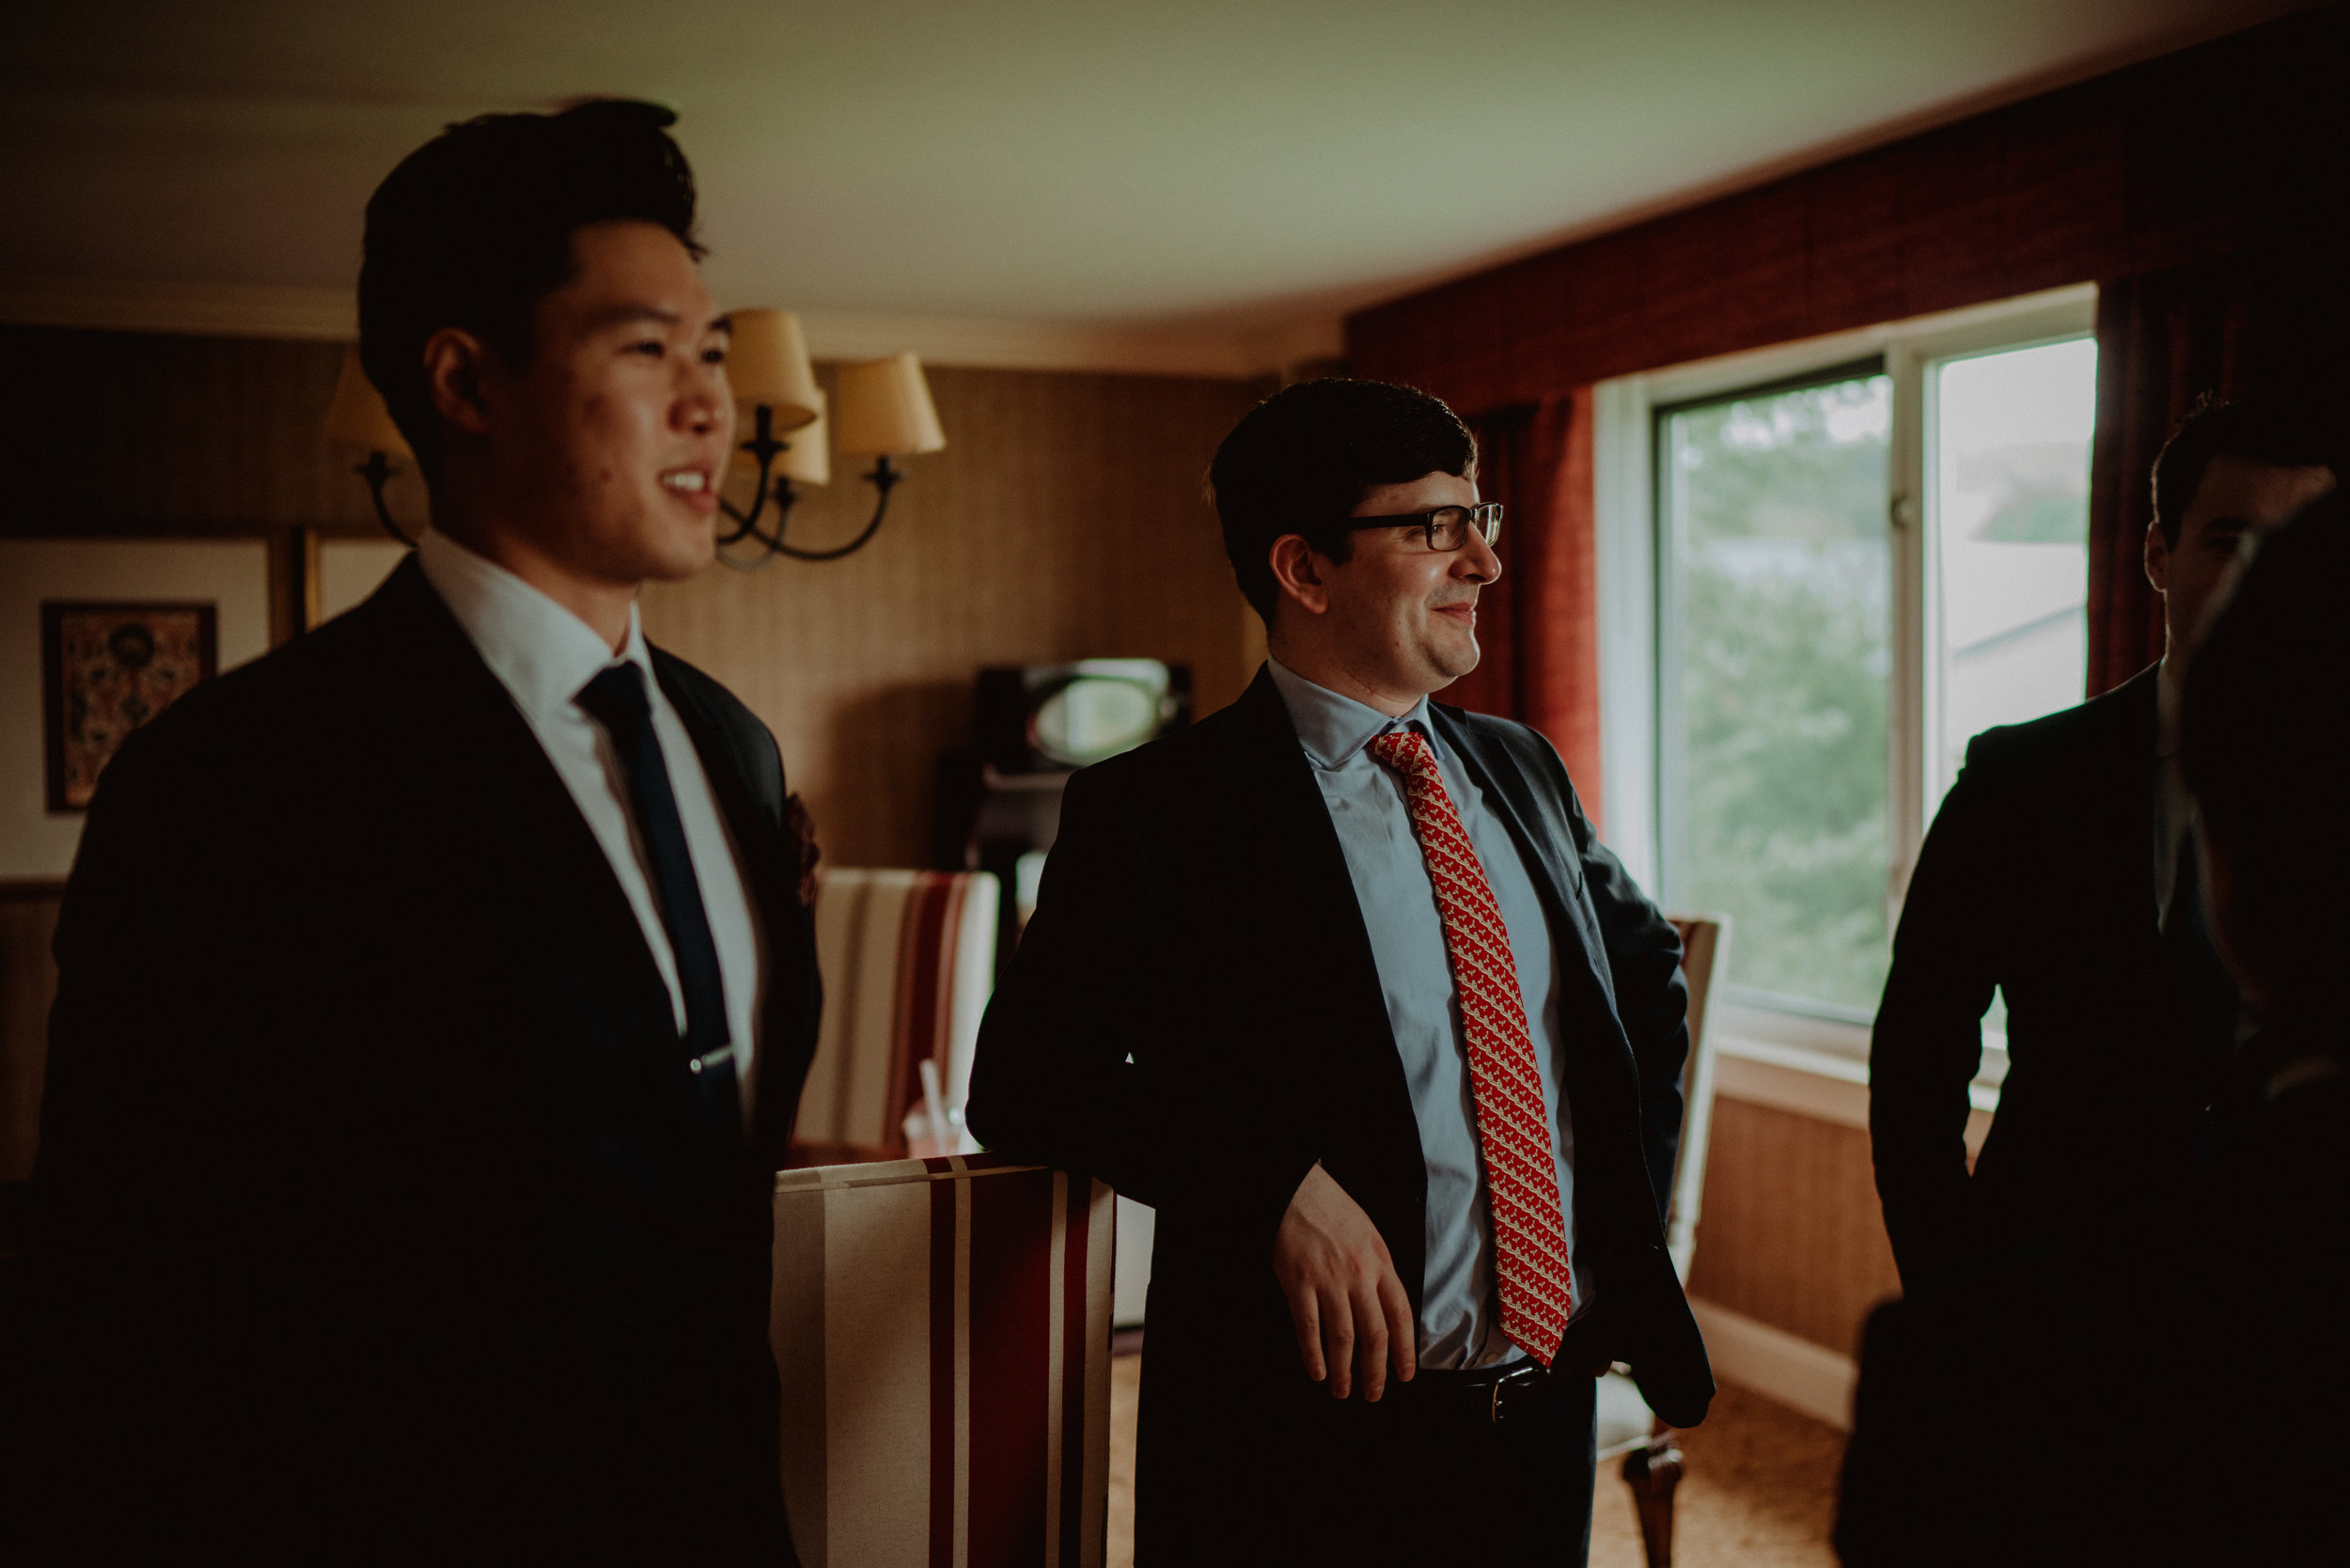 Irene-and-Jae-2019_Brooklyn_Wedding_Photographer_Chellise_Michael_Photography--7.jpg